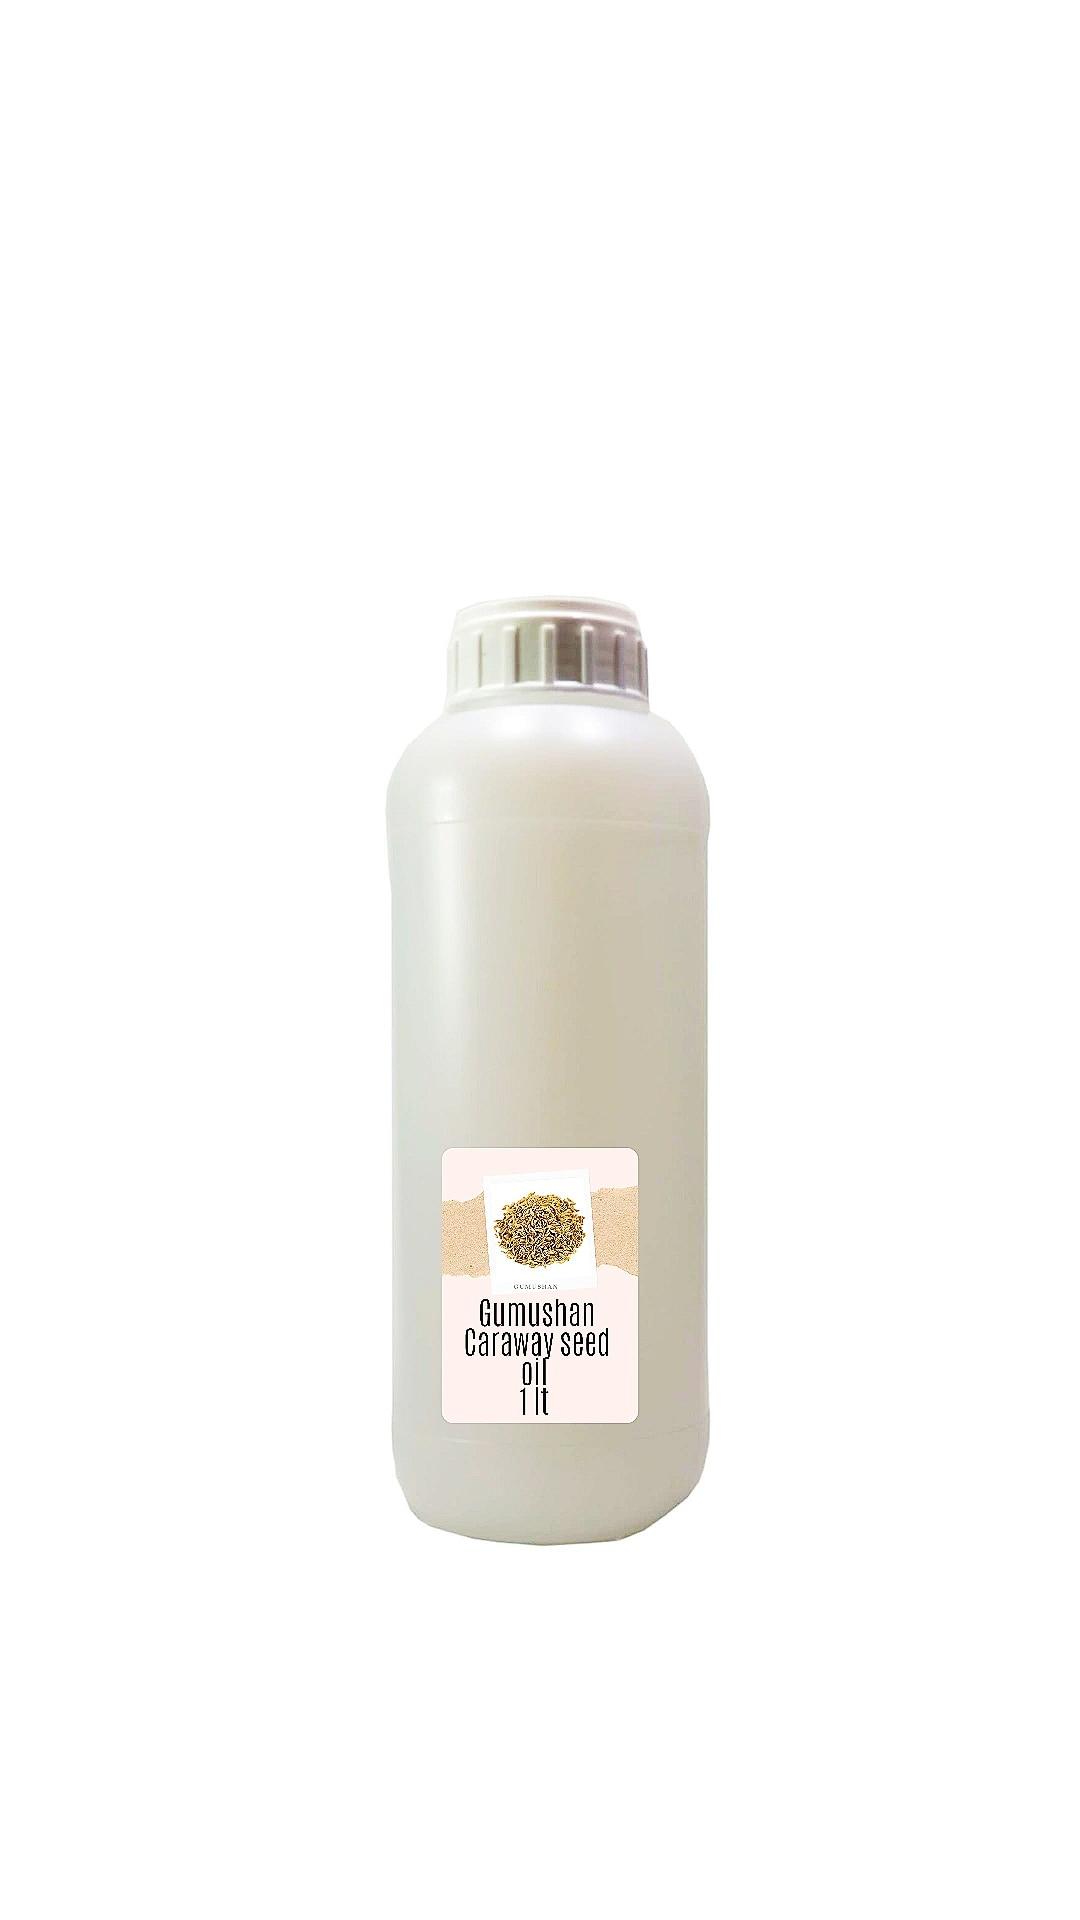 High quality pure Caraway Seed Oil 1 liter 34 fl oz 1000ml